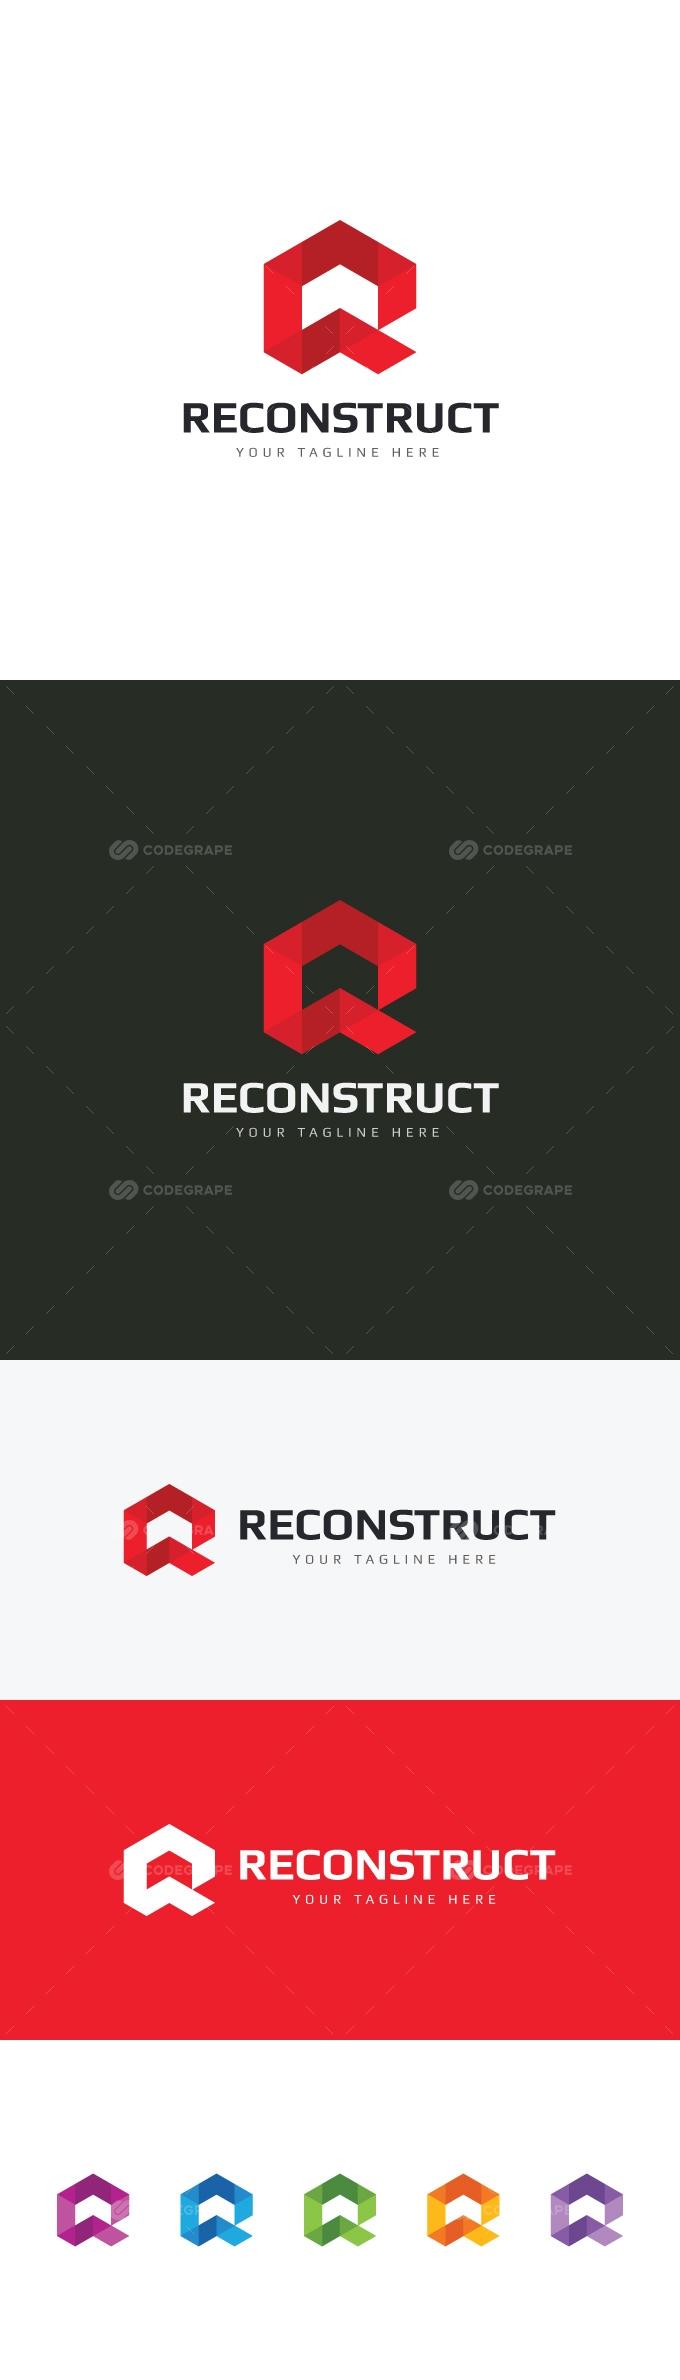 Reconstruct Logo